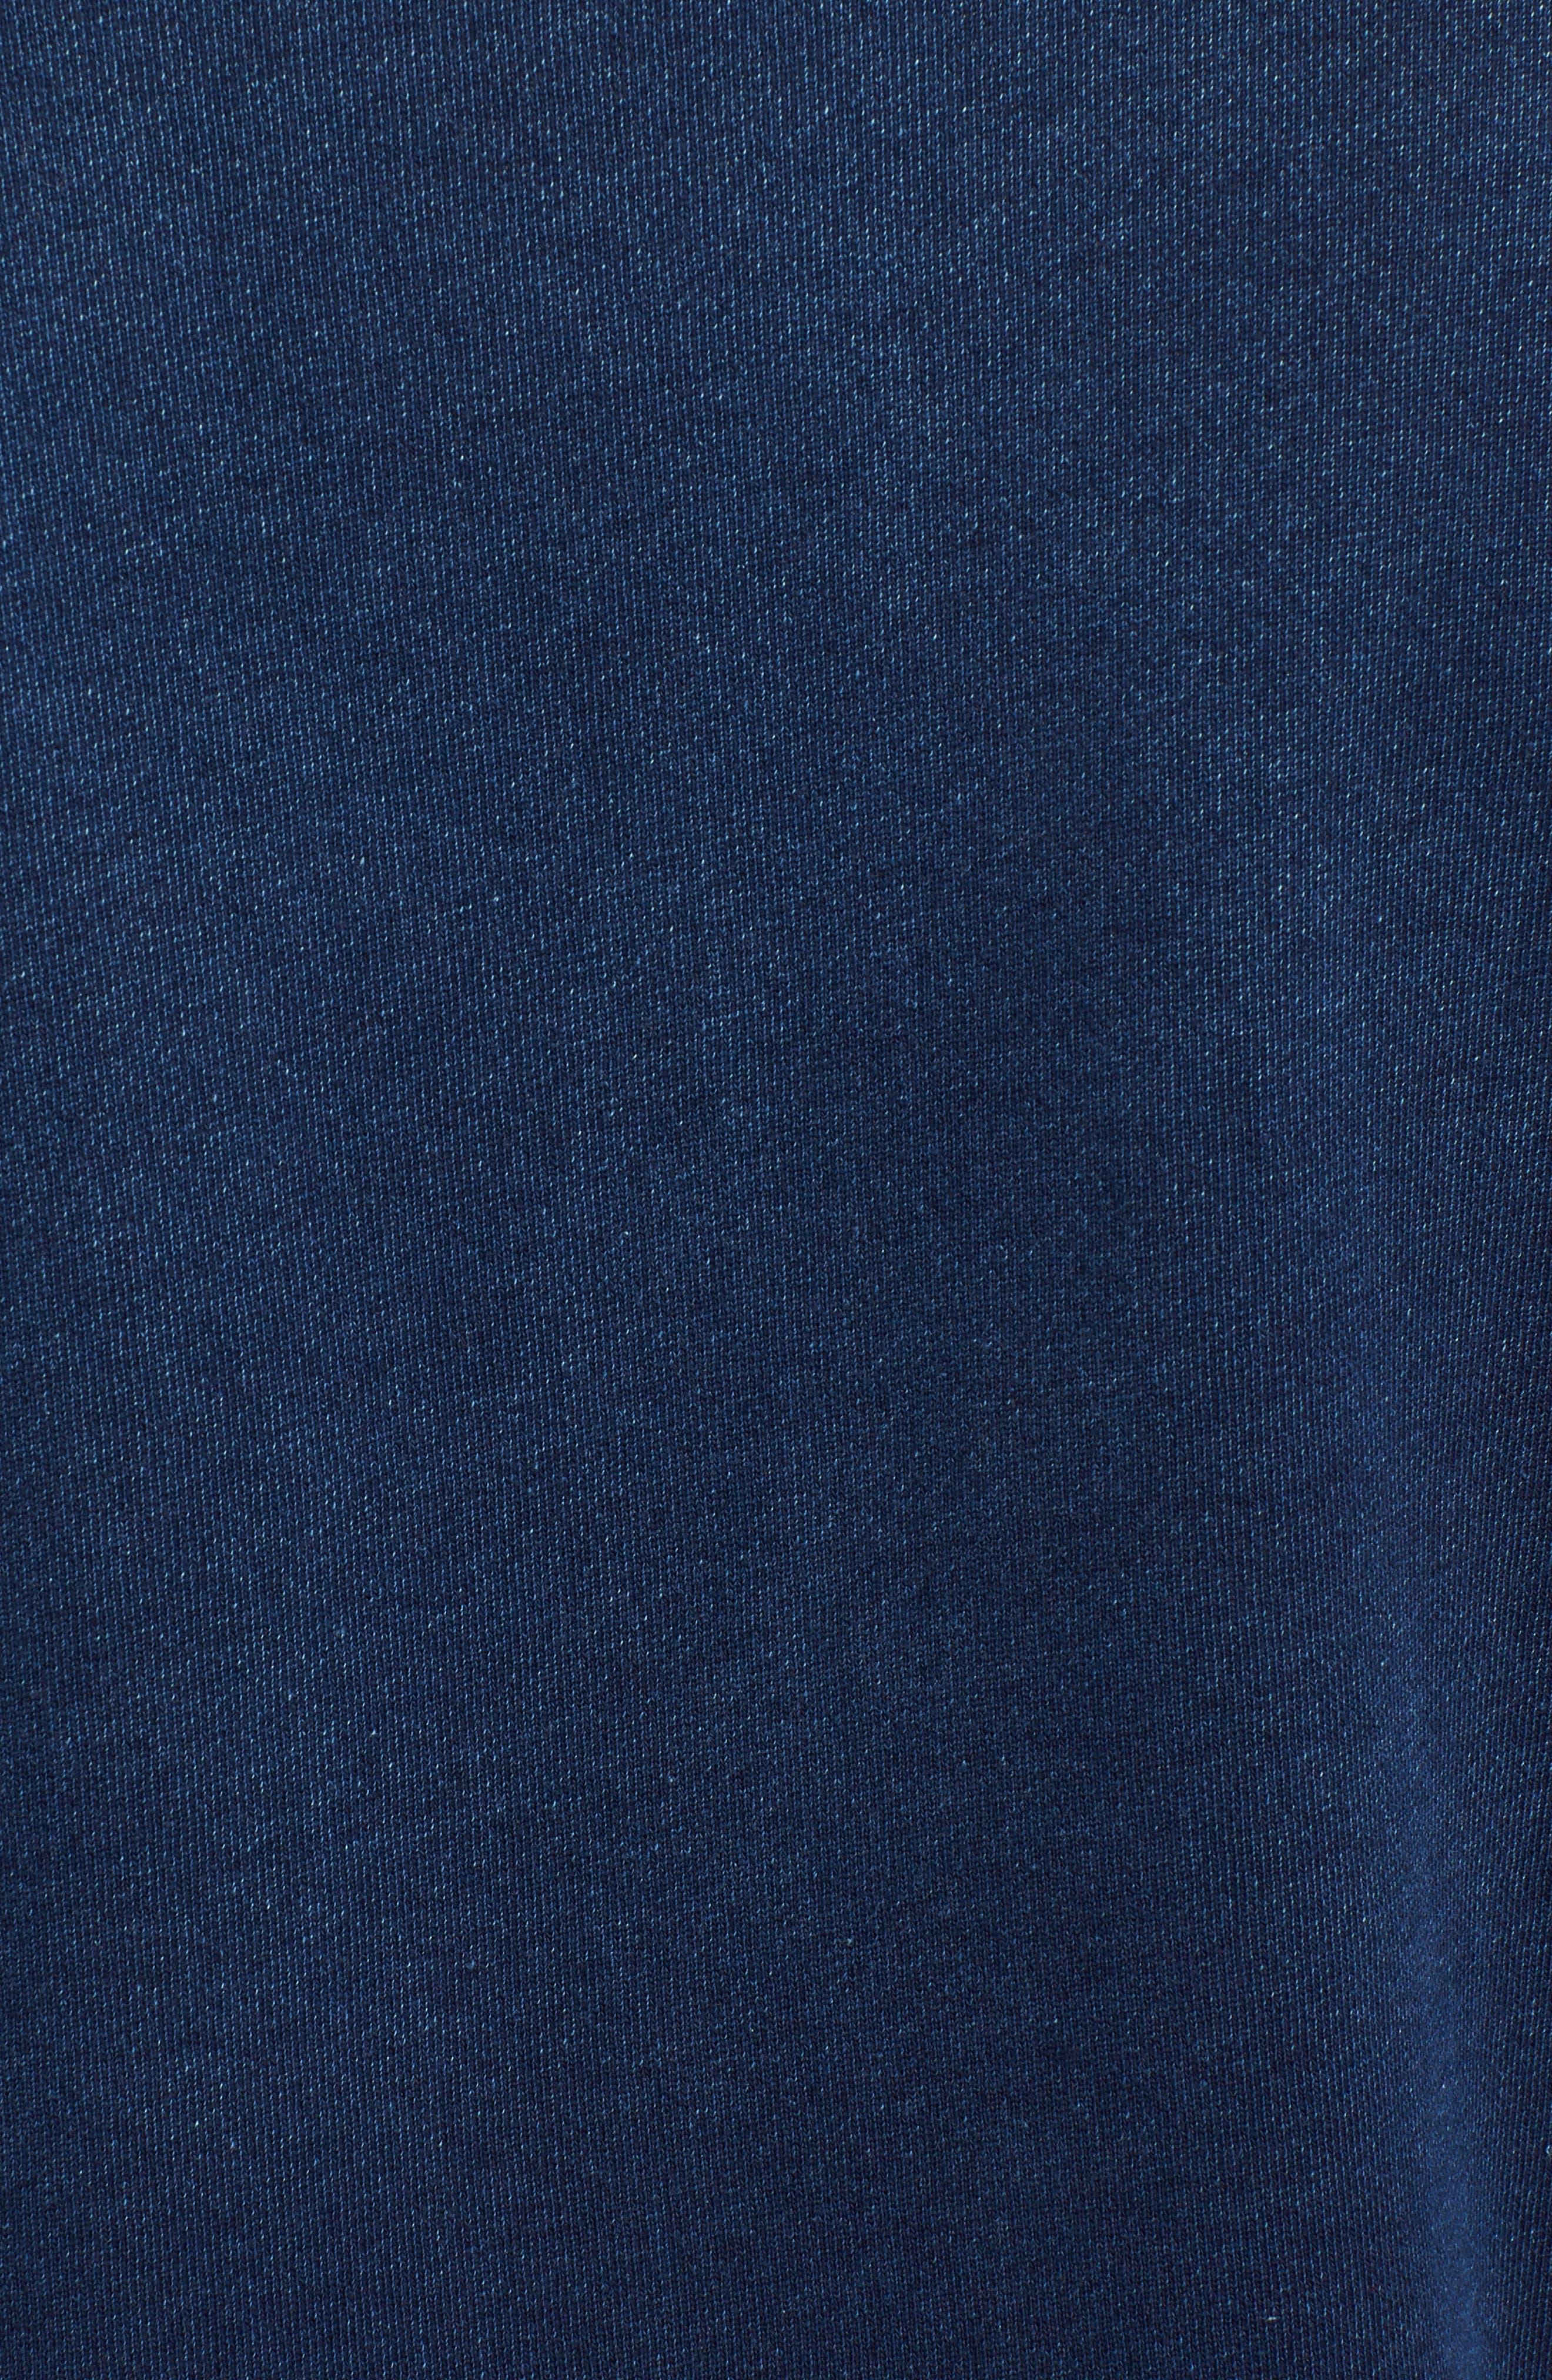 Byron Crewneck Cotton Pocket Sweatshirt,                             Alternate thumbnail 5, color,                             Harbor